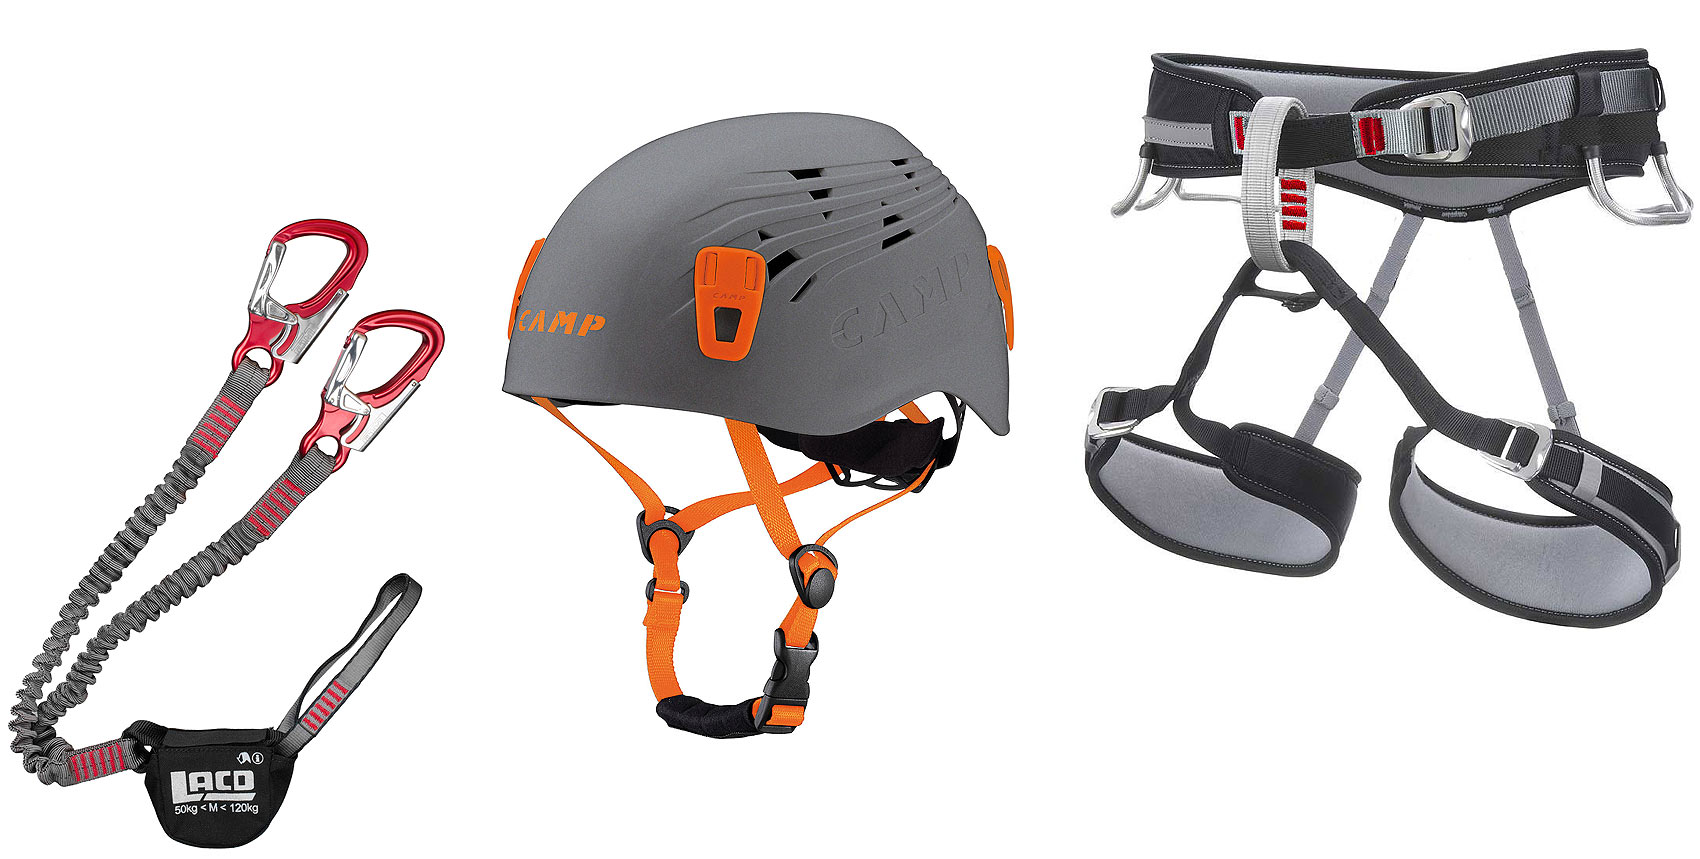 Klettersteigset Funktion : Willkommen bei mountain sport.de